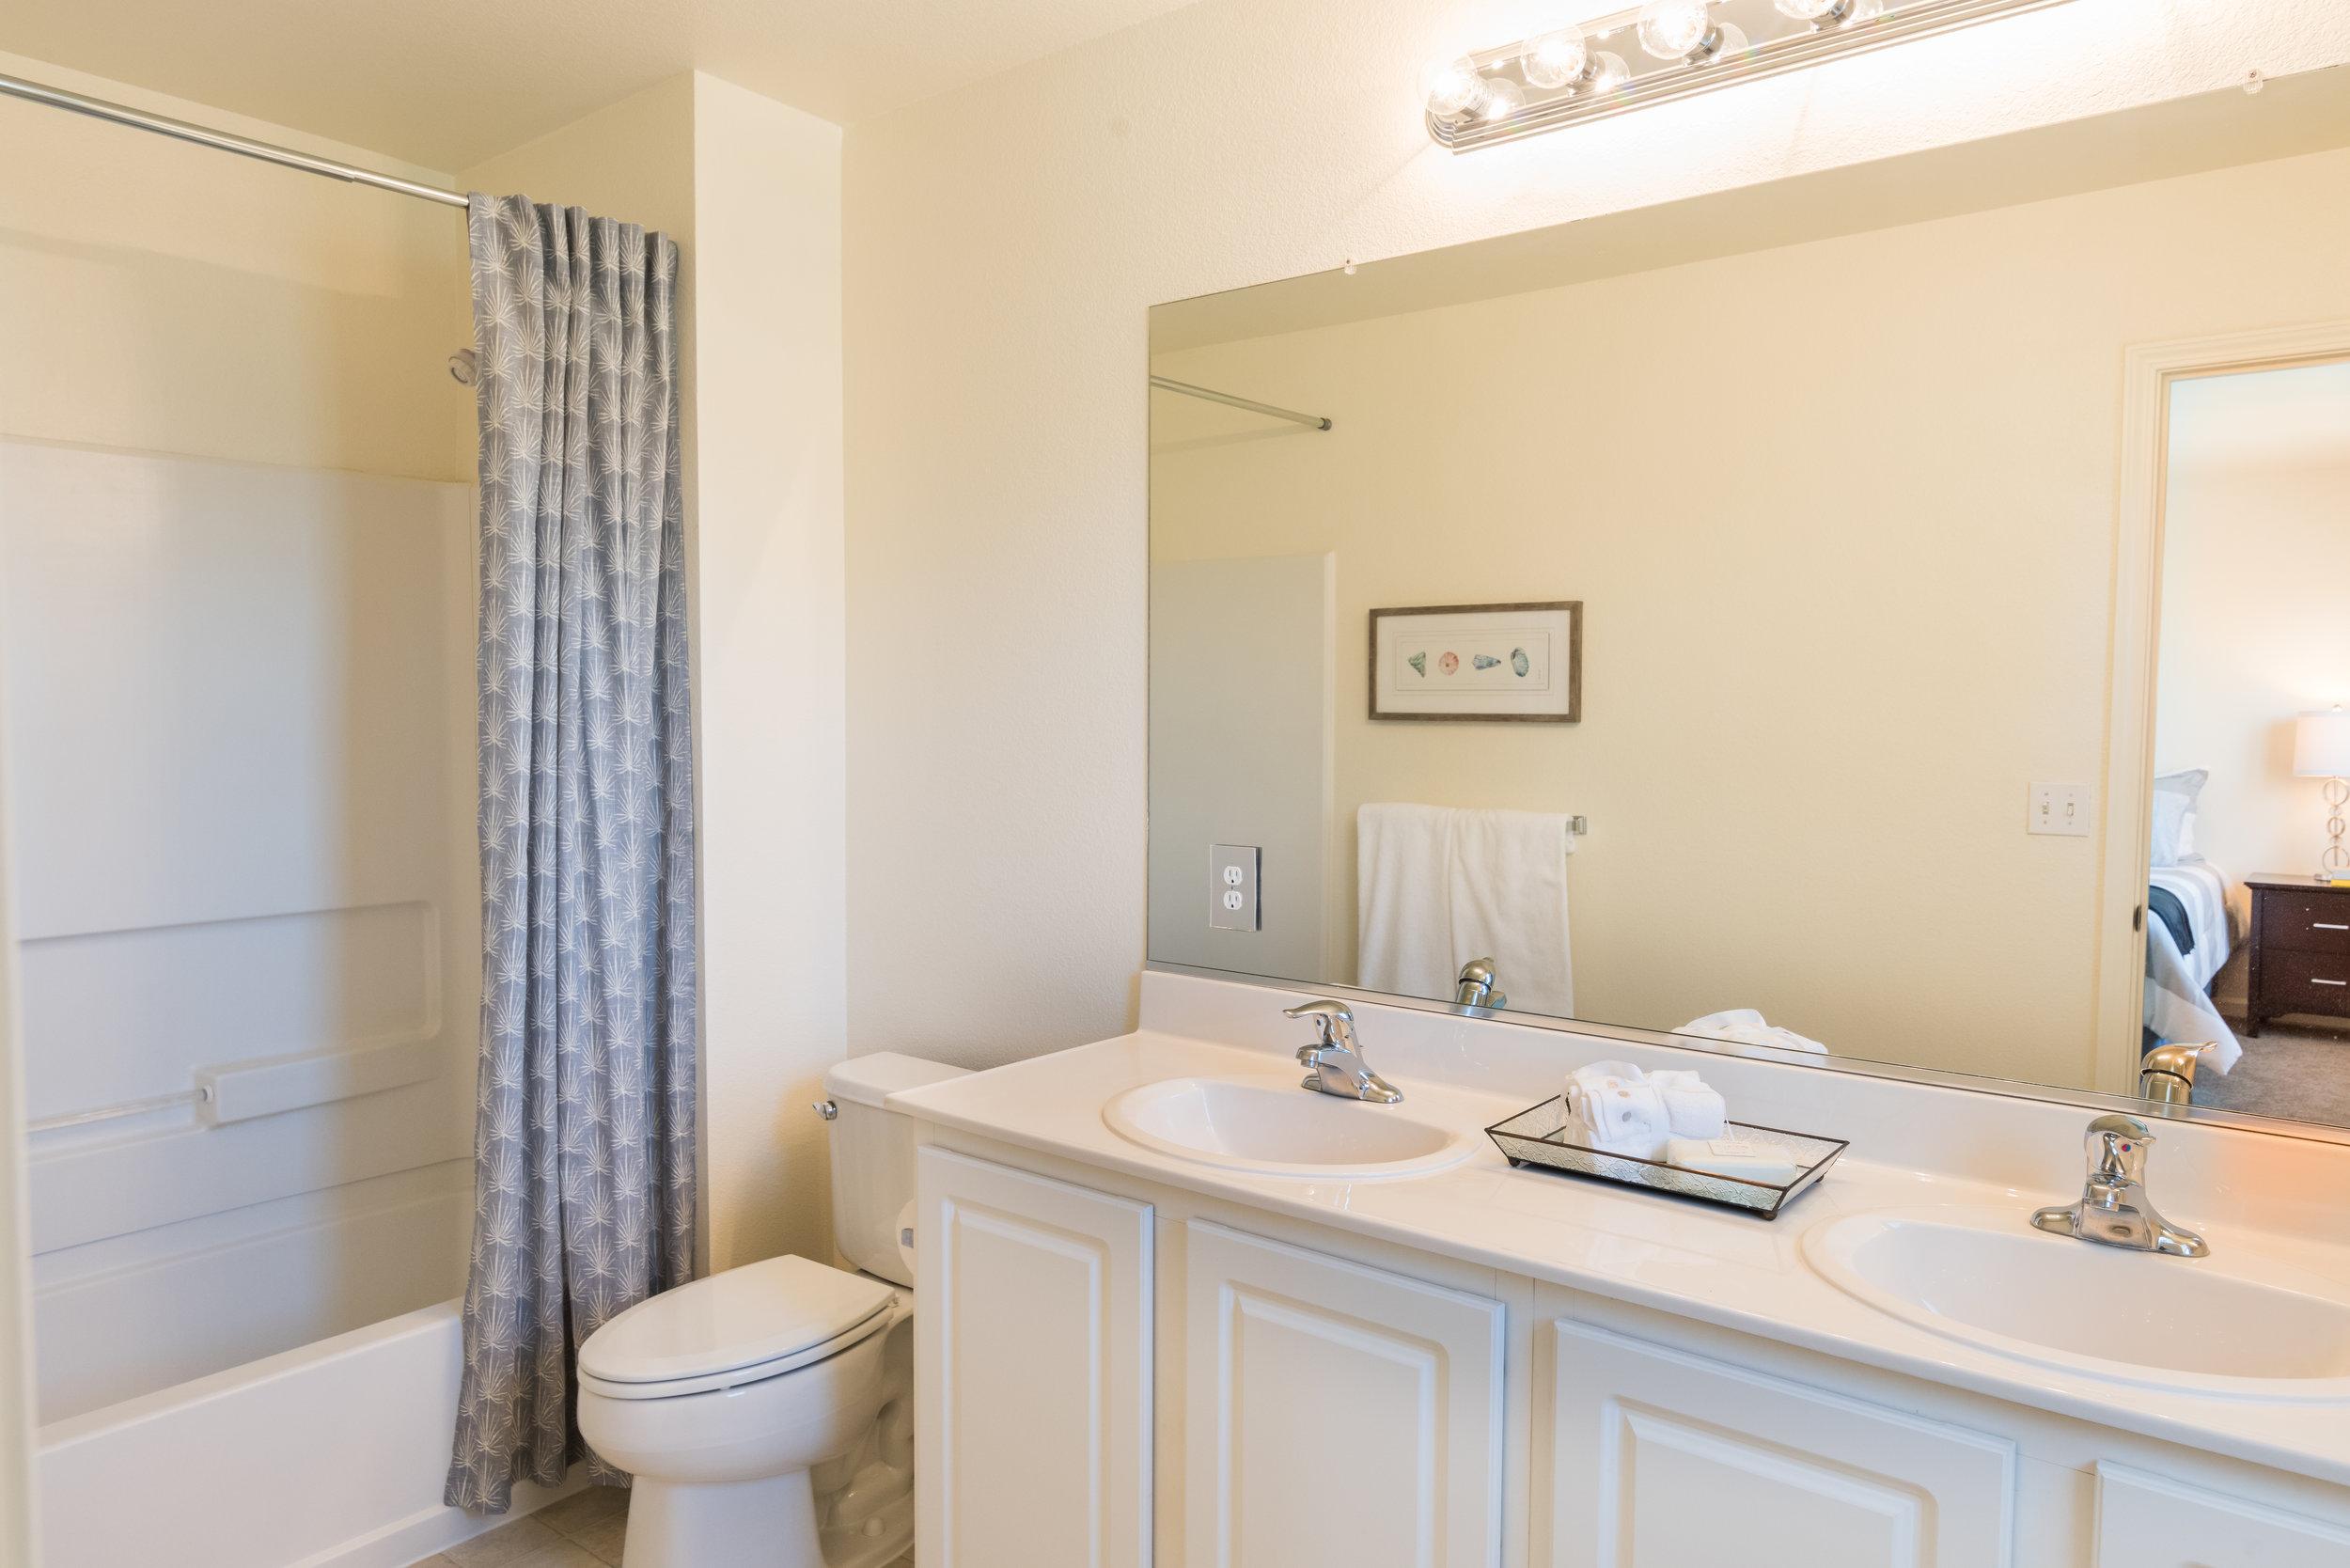 Master Bathroom in Rental Home